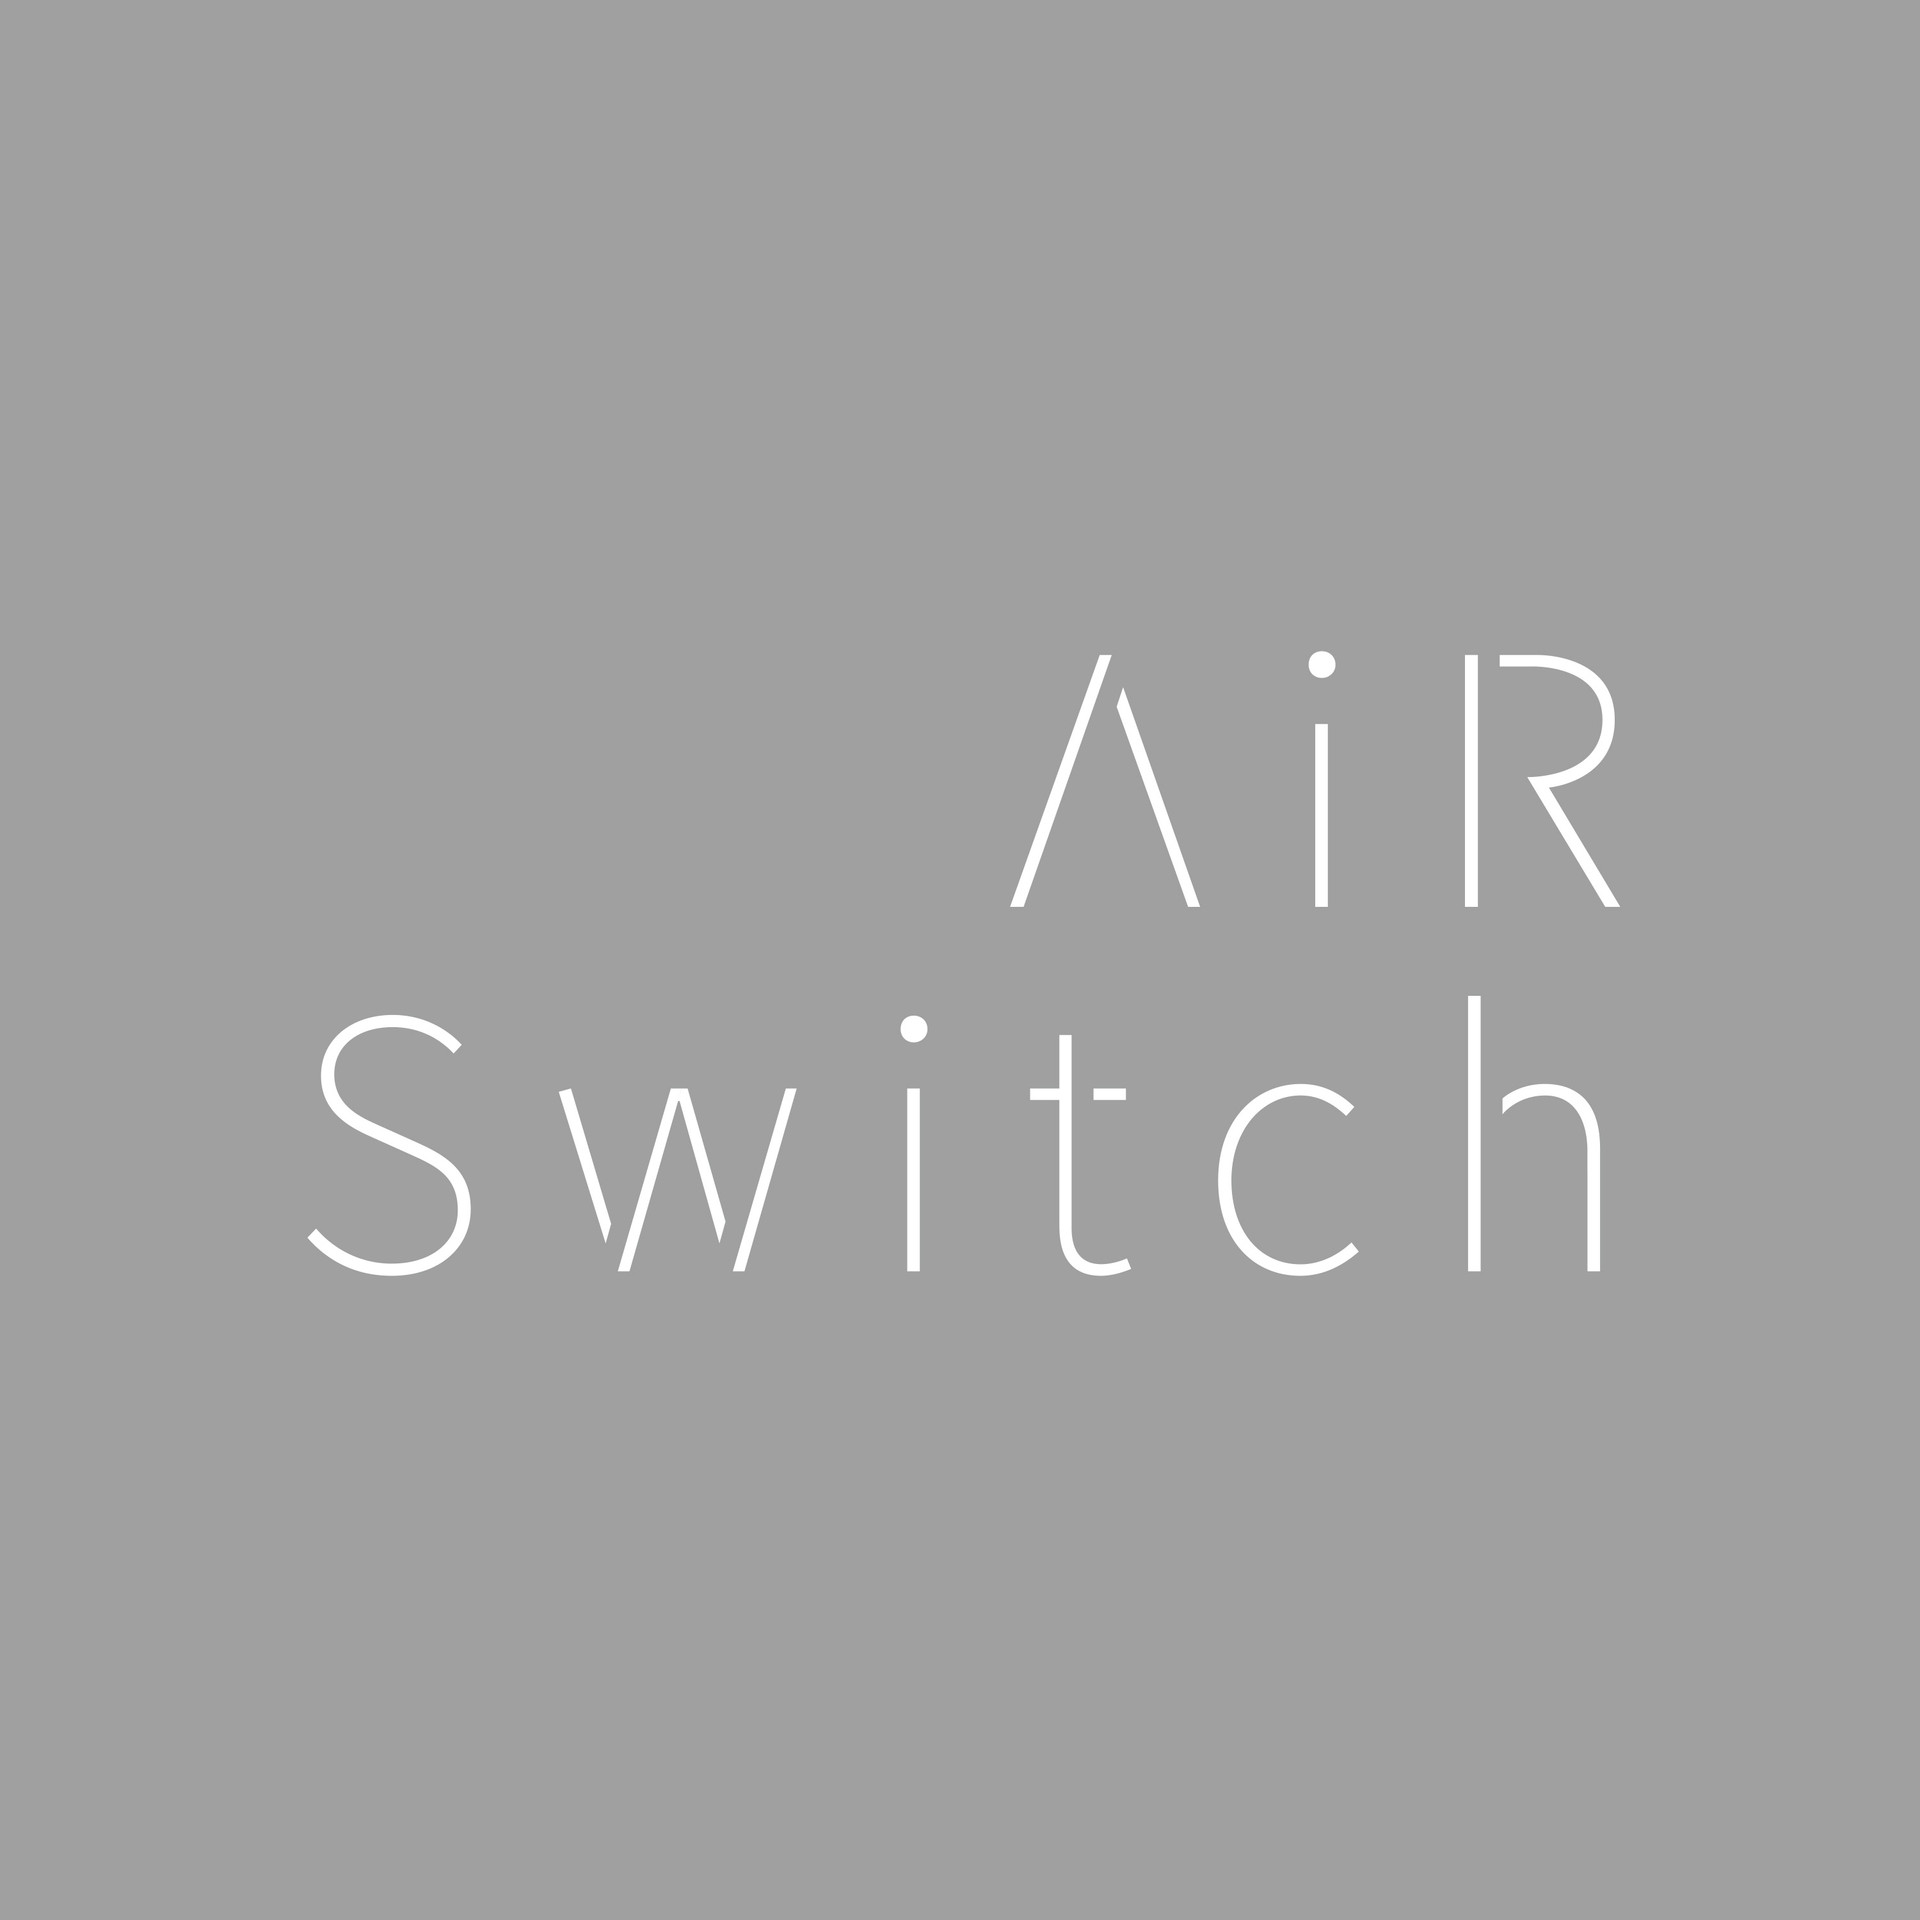 AirSwitchロゴ.jpg